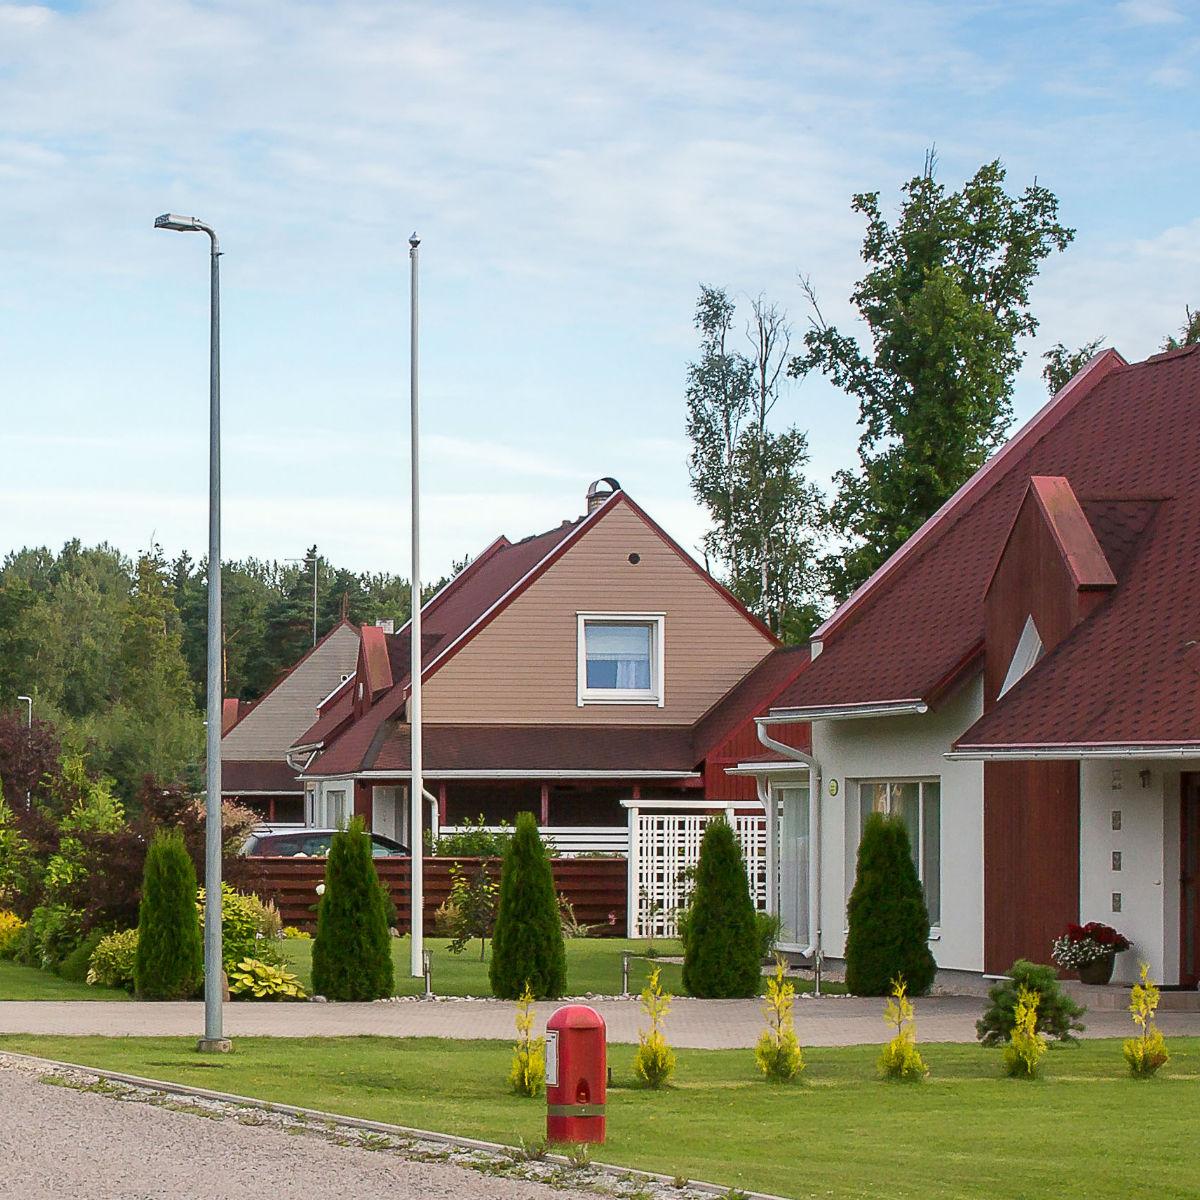 Lõviküla residential area